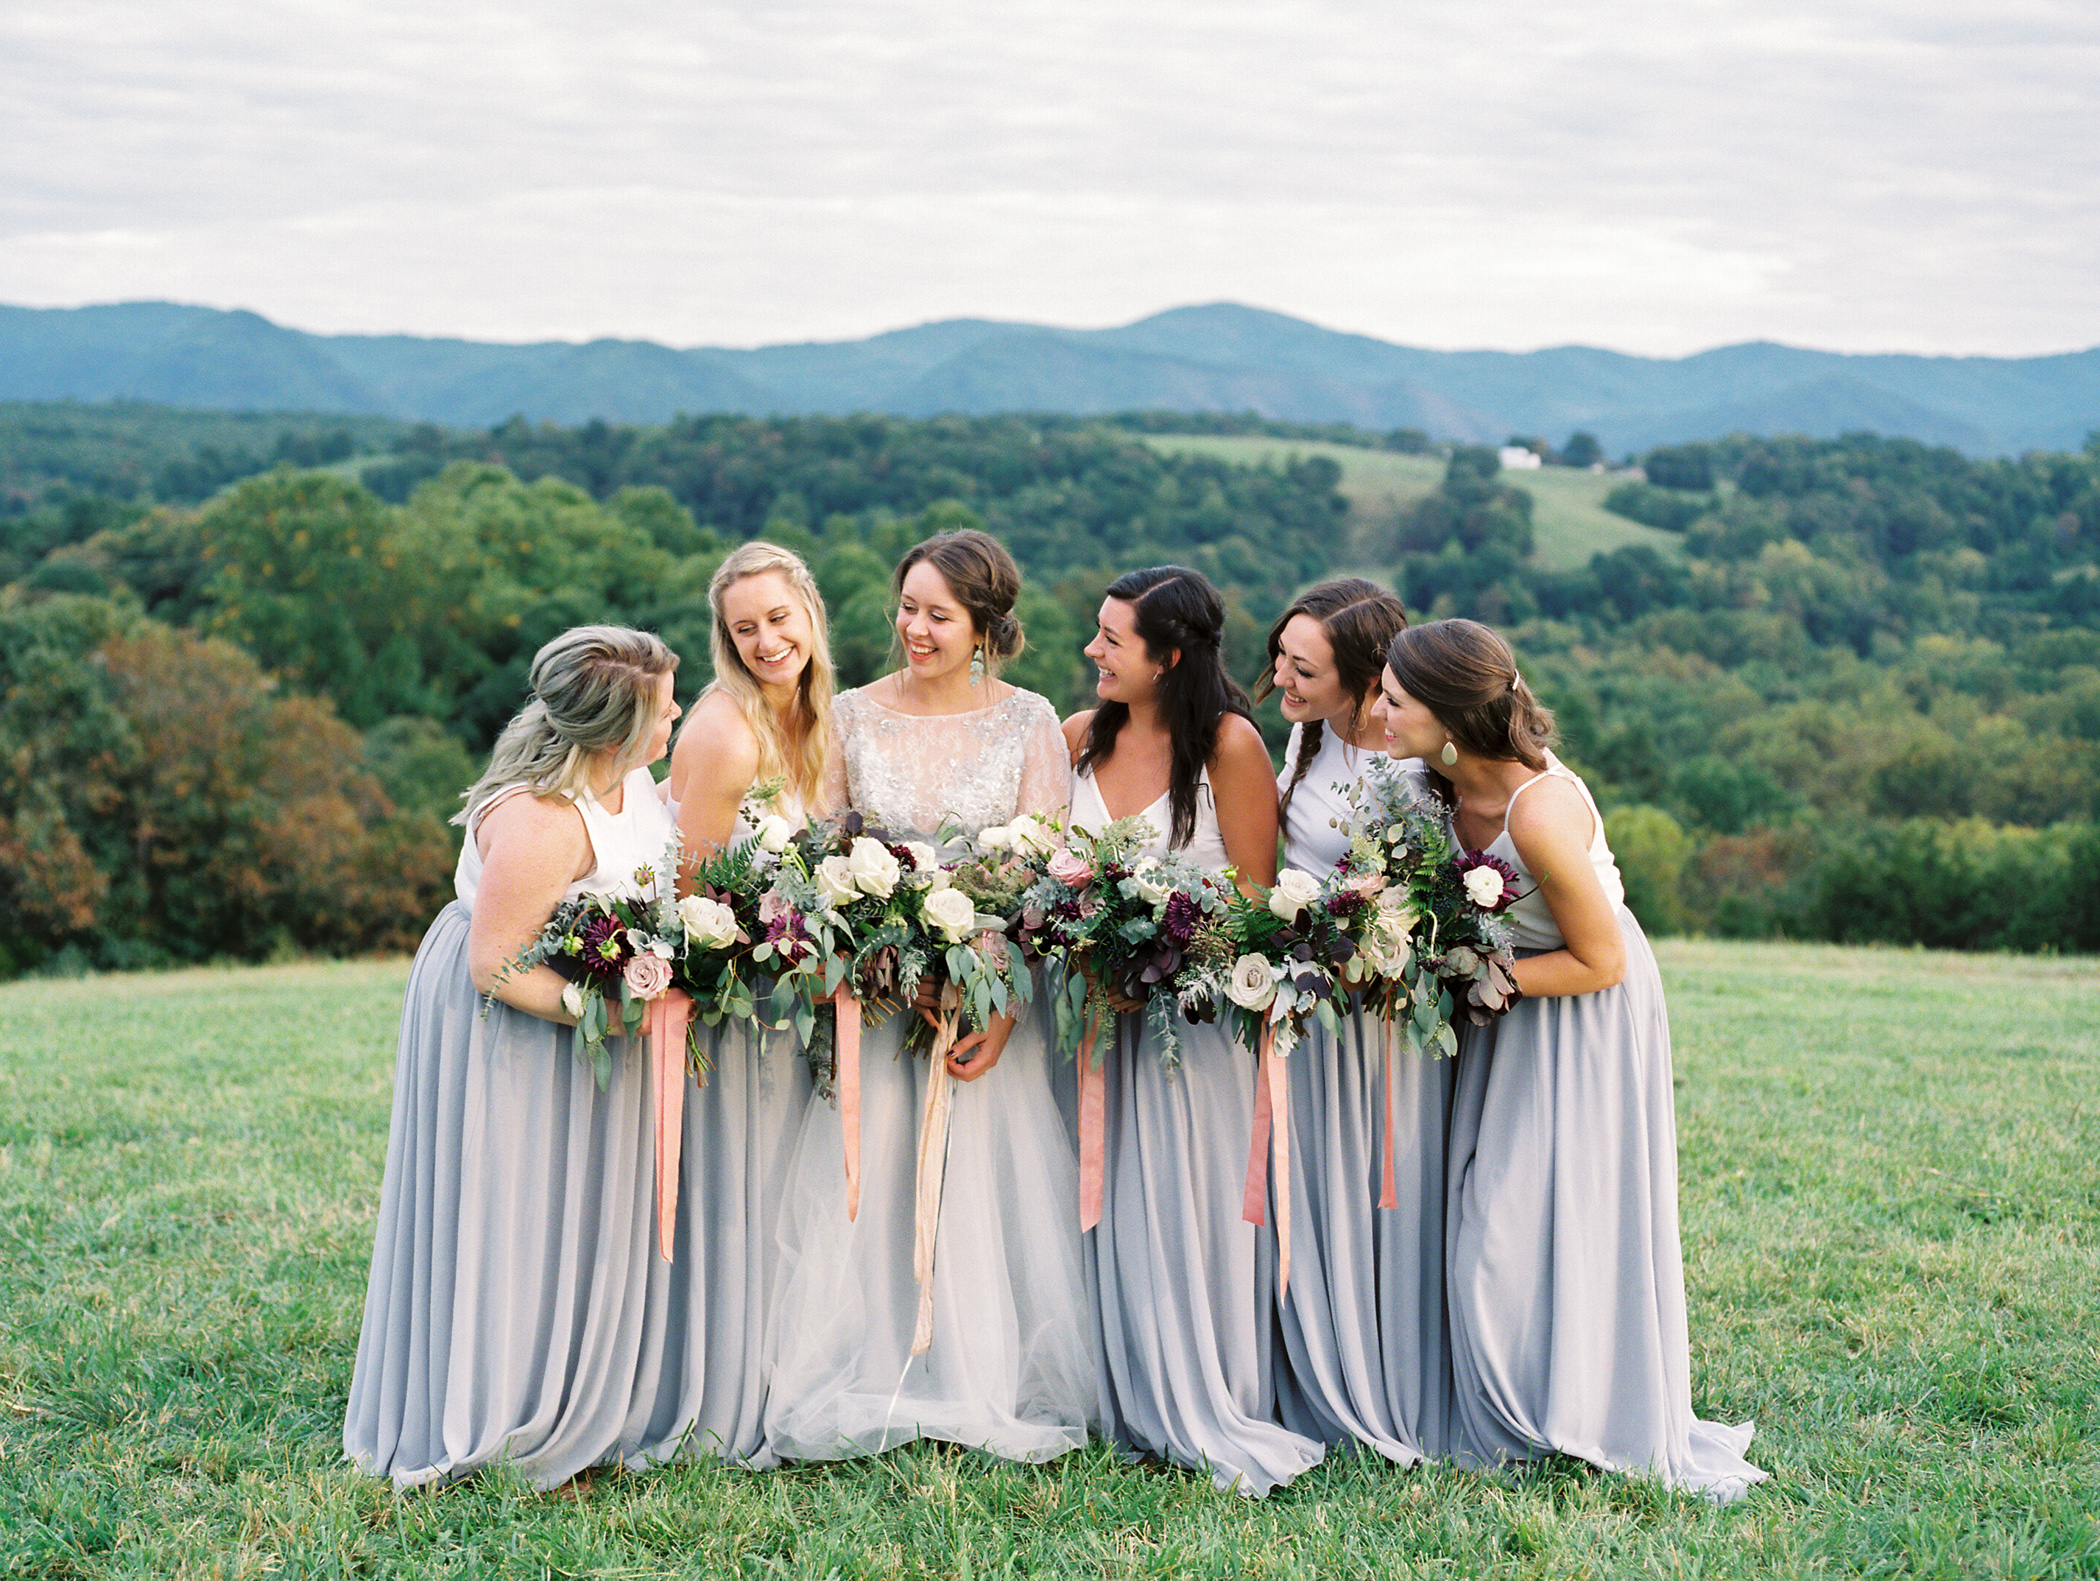 Charlotte-Film-Wedding_Photographer-heartstone-lodge-virginia-29.jpg